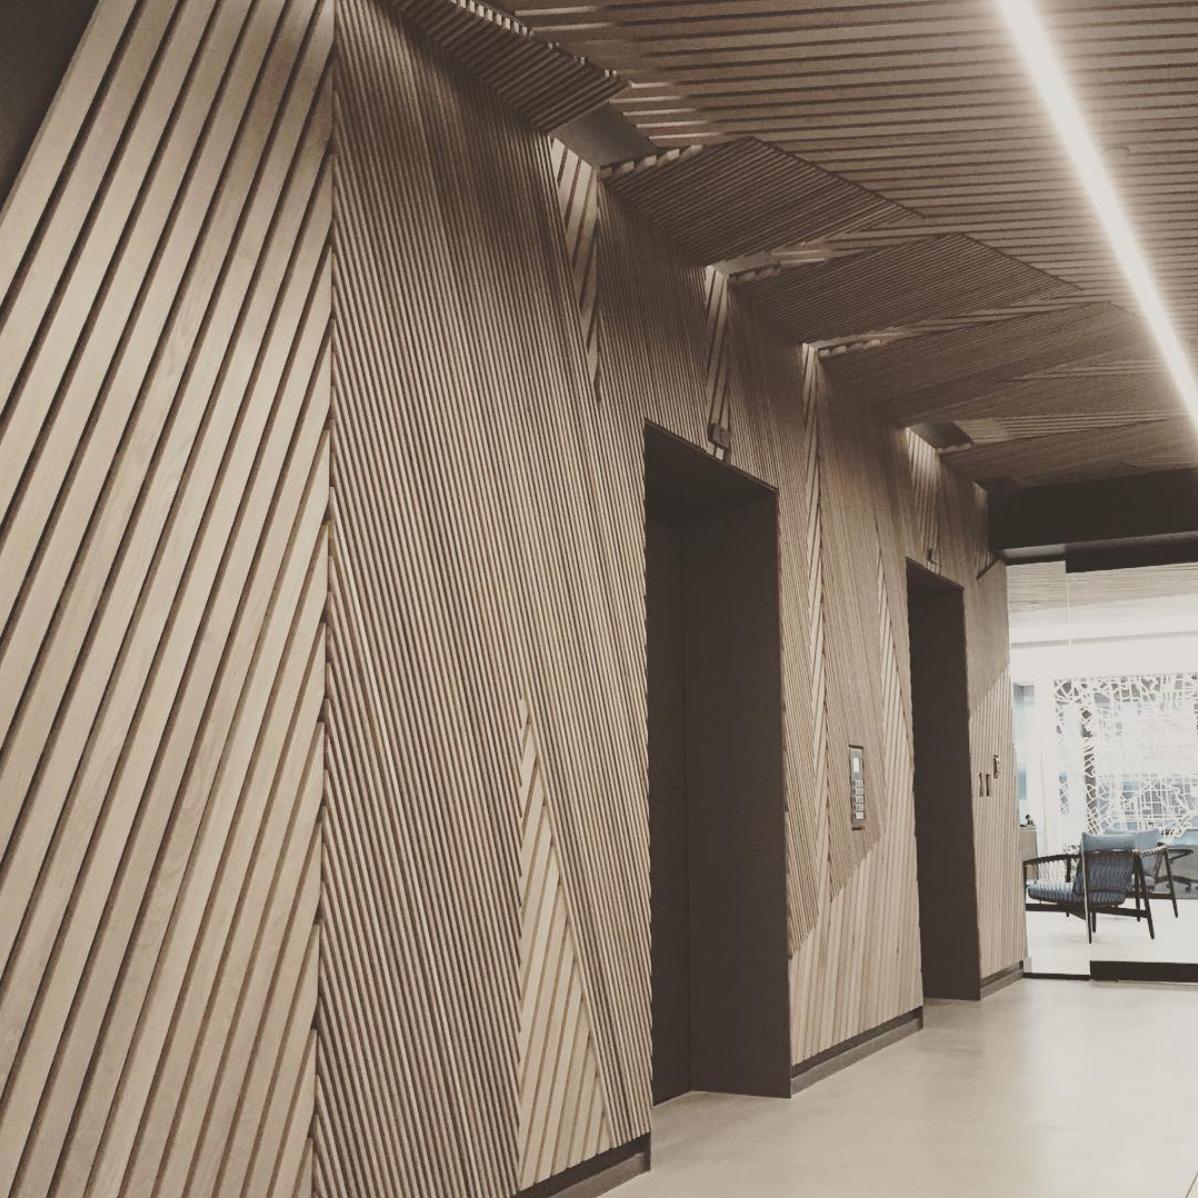 Nike Headquarters Branded Environment Elevator Lobby Design